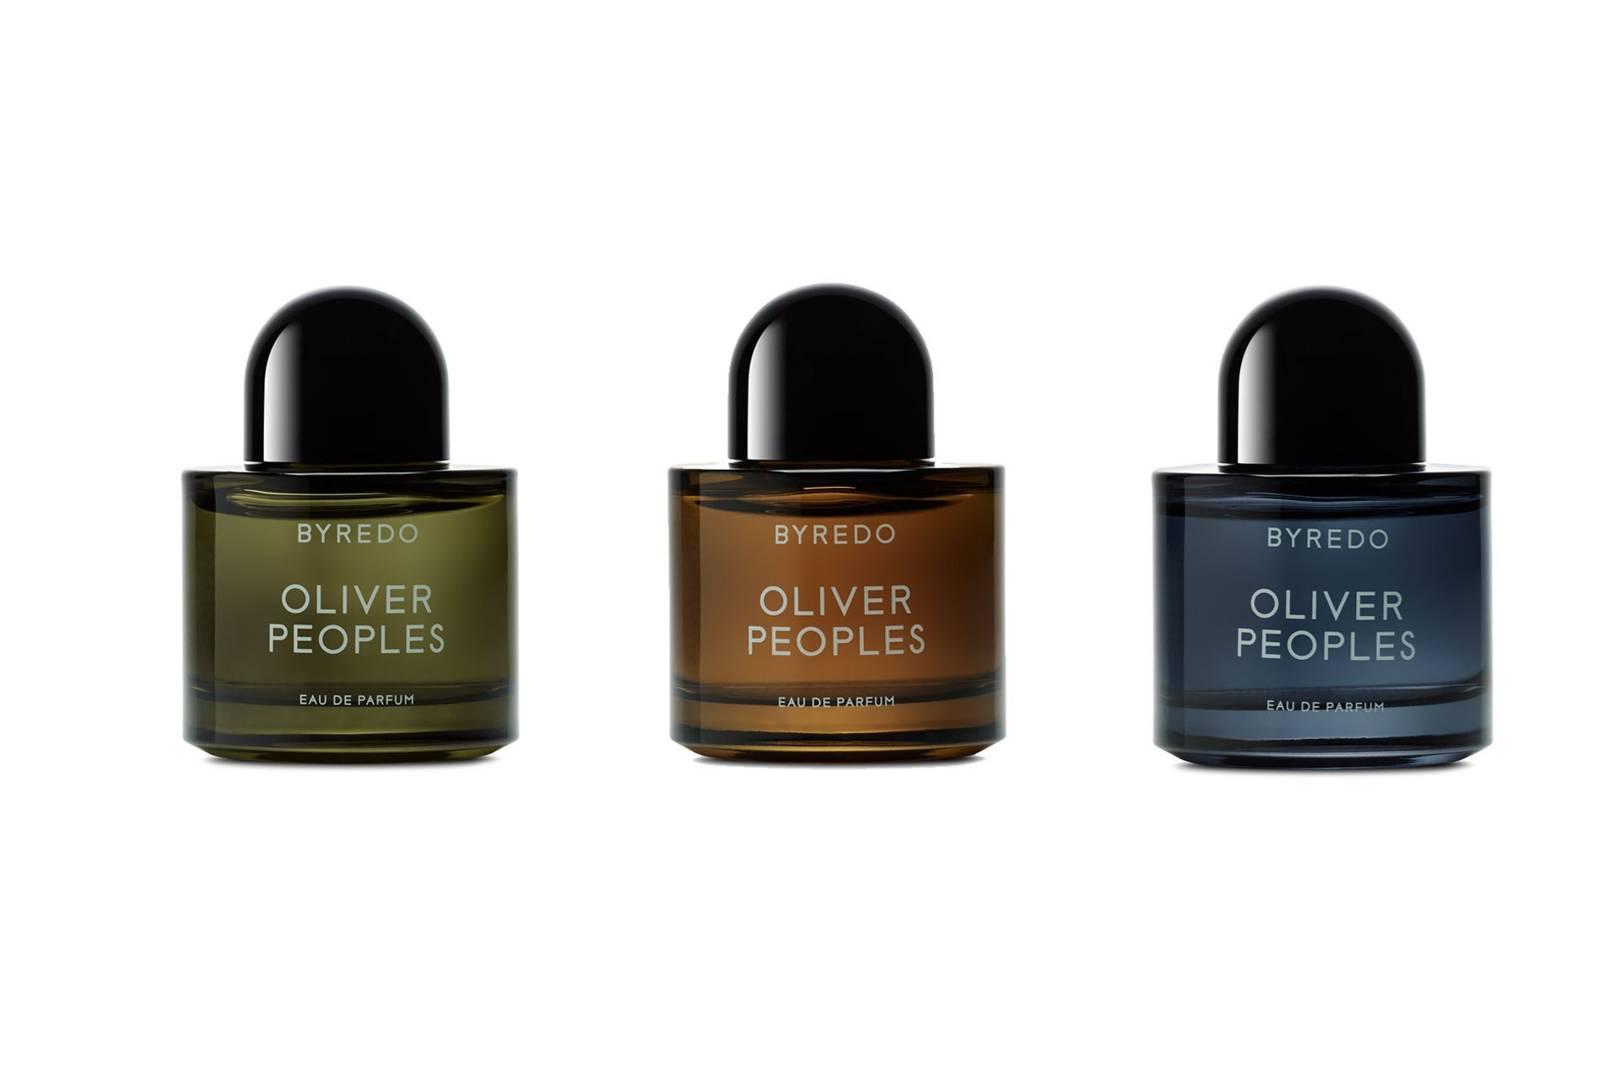 3943d0685857 Byredo X Oliver Peoples Fragrance   Sunglasses Collaboration ...